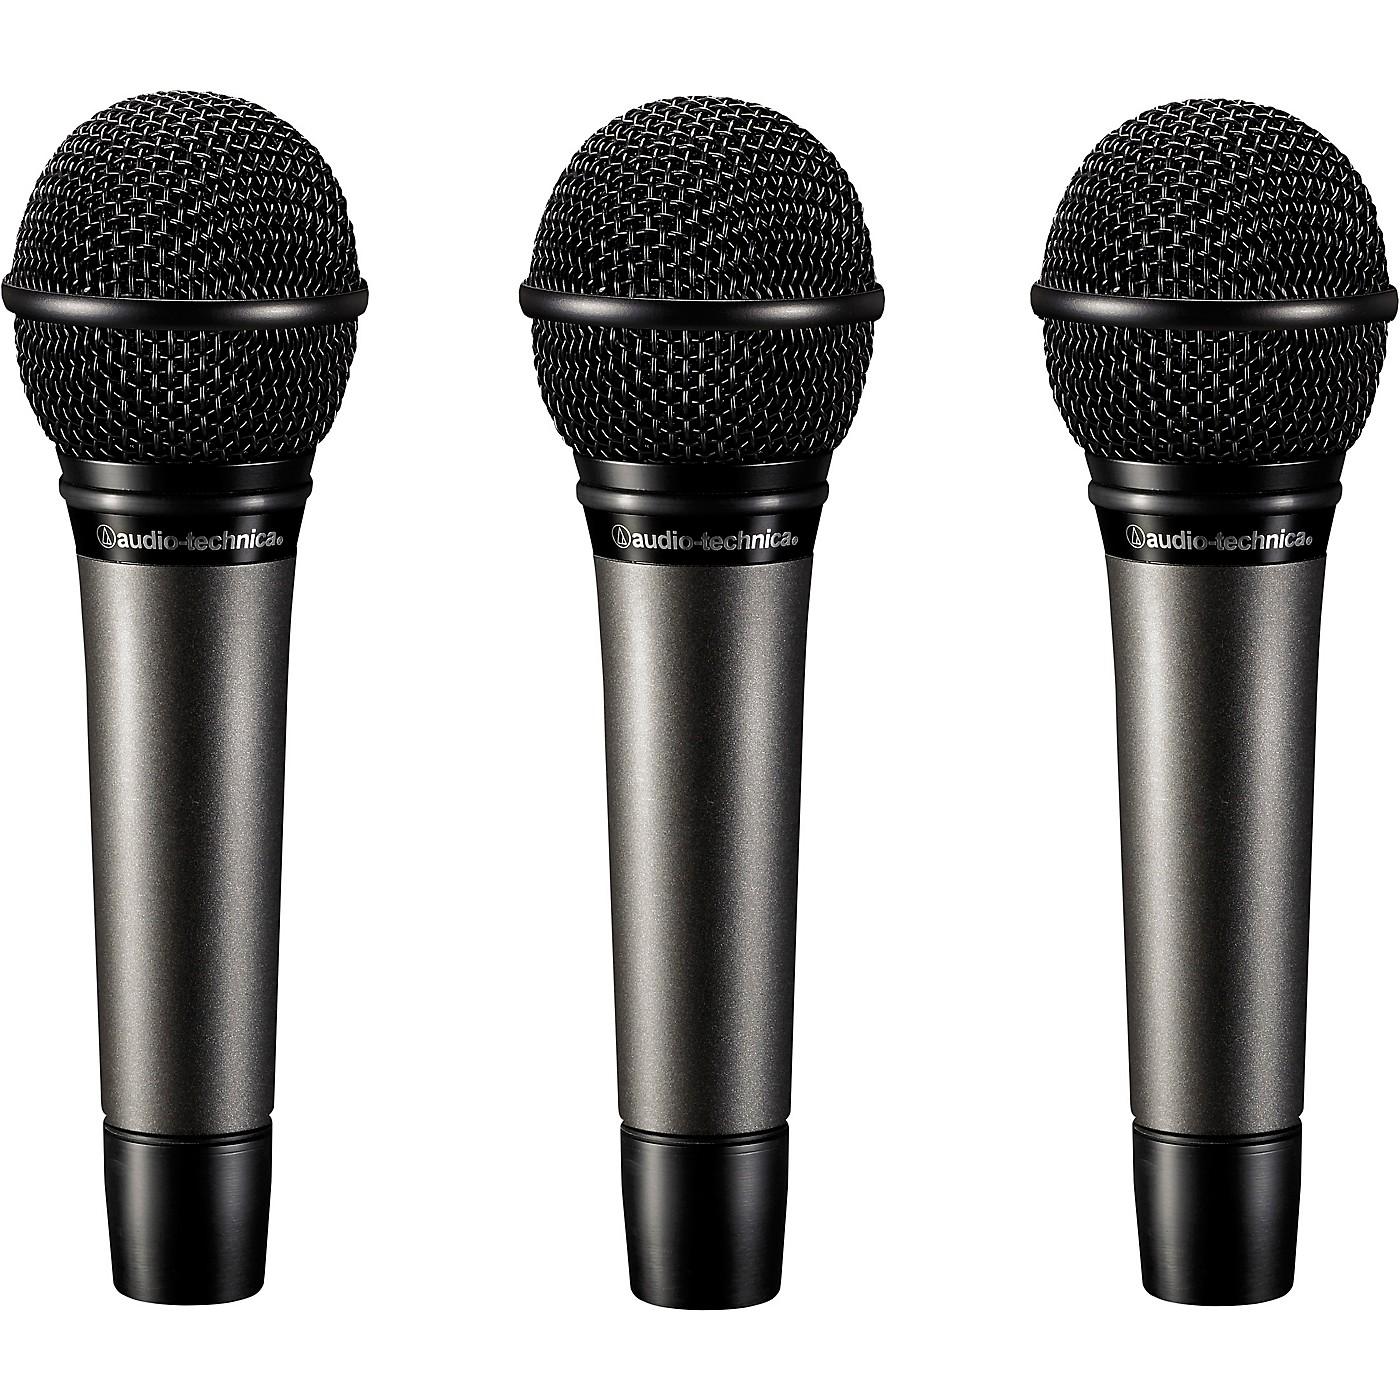 Audio-Technica ATM510 VOCAL PACK - 3 PIECE thumbnail